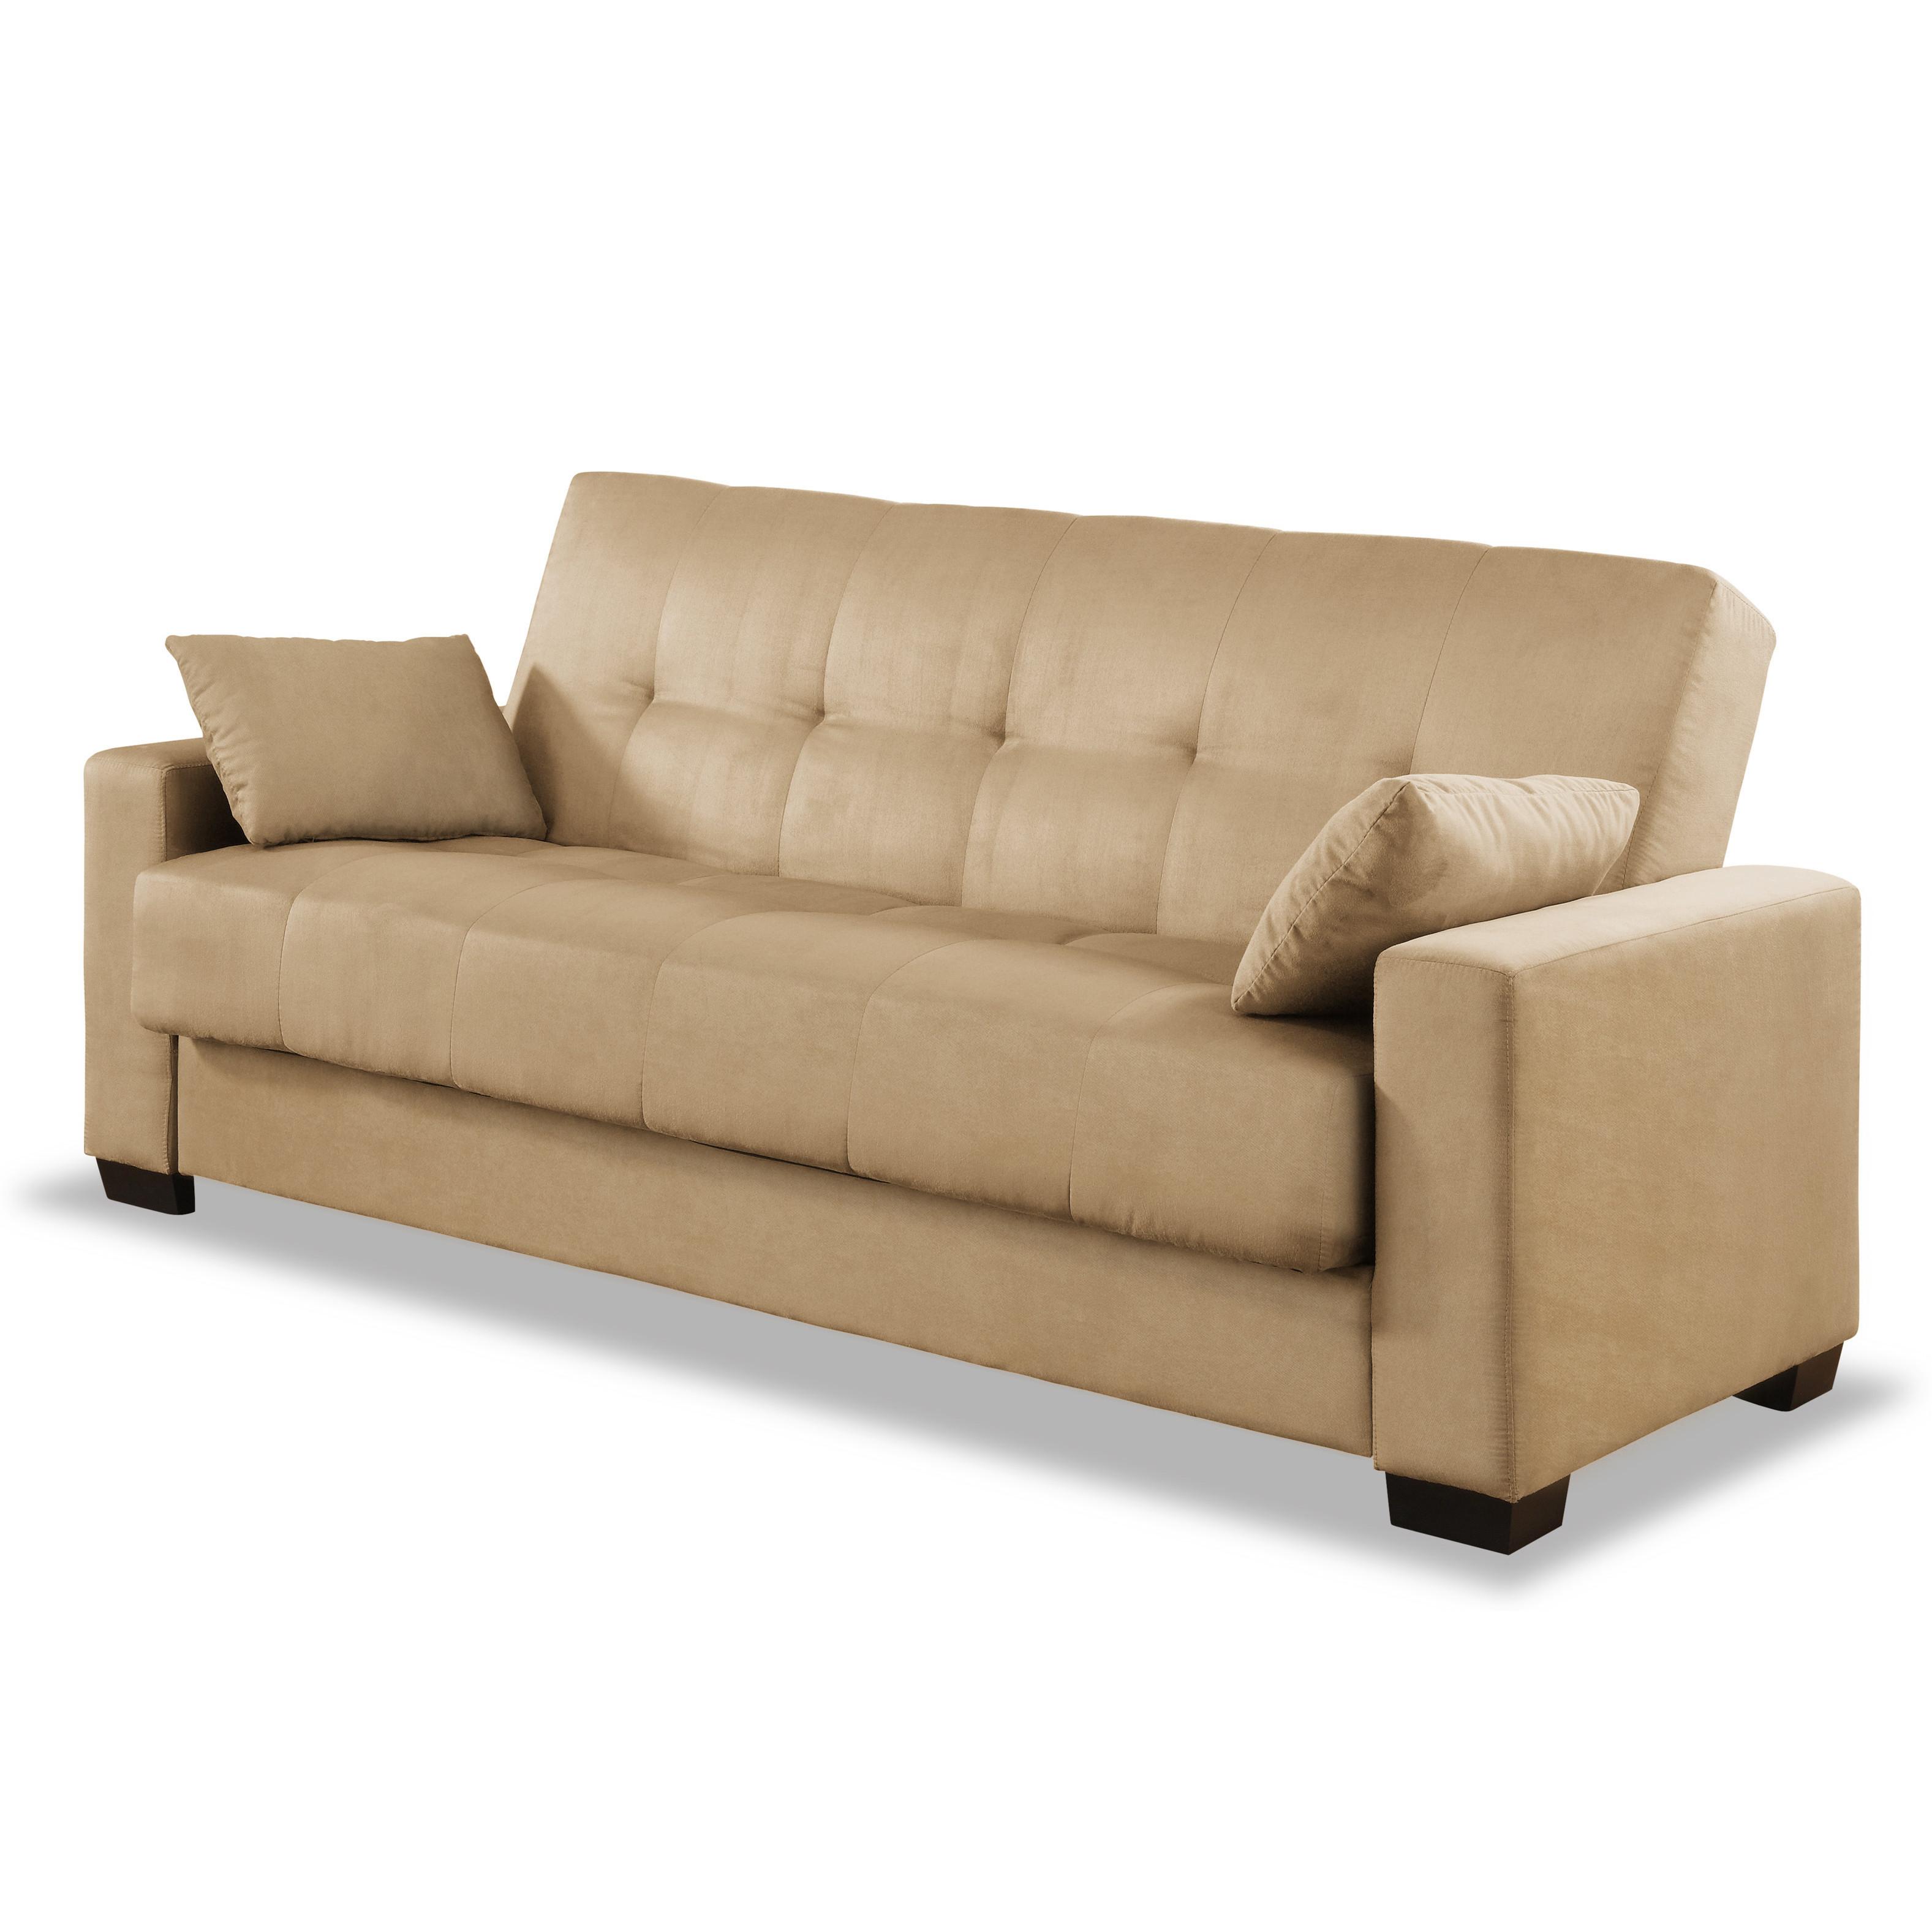 Sleeper Sofa Boston